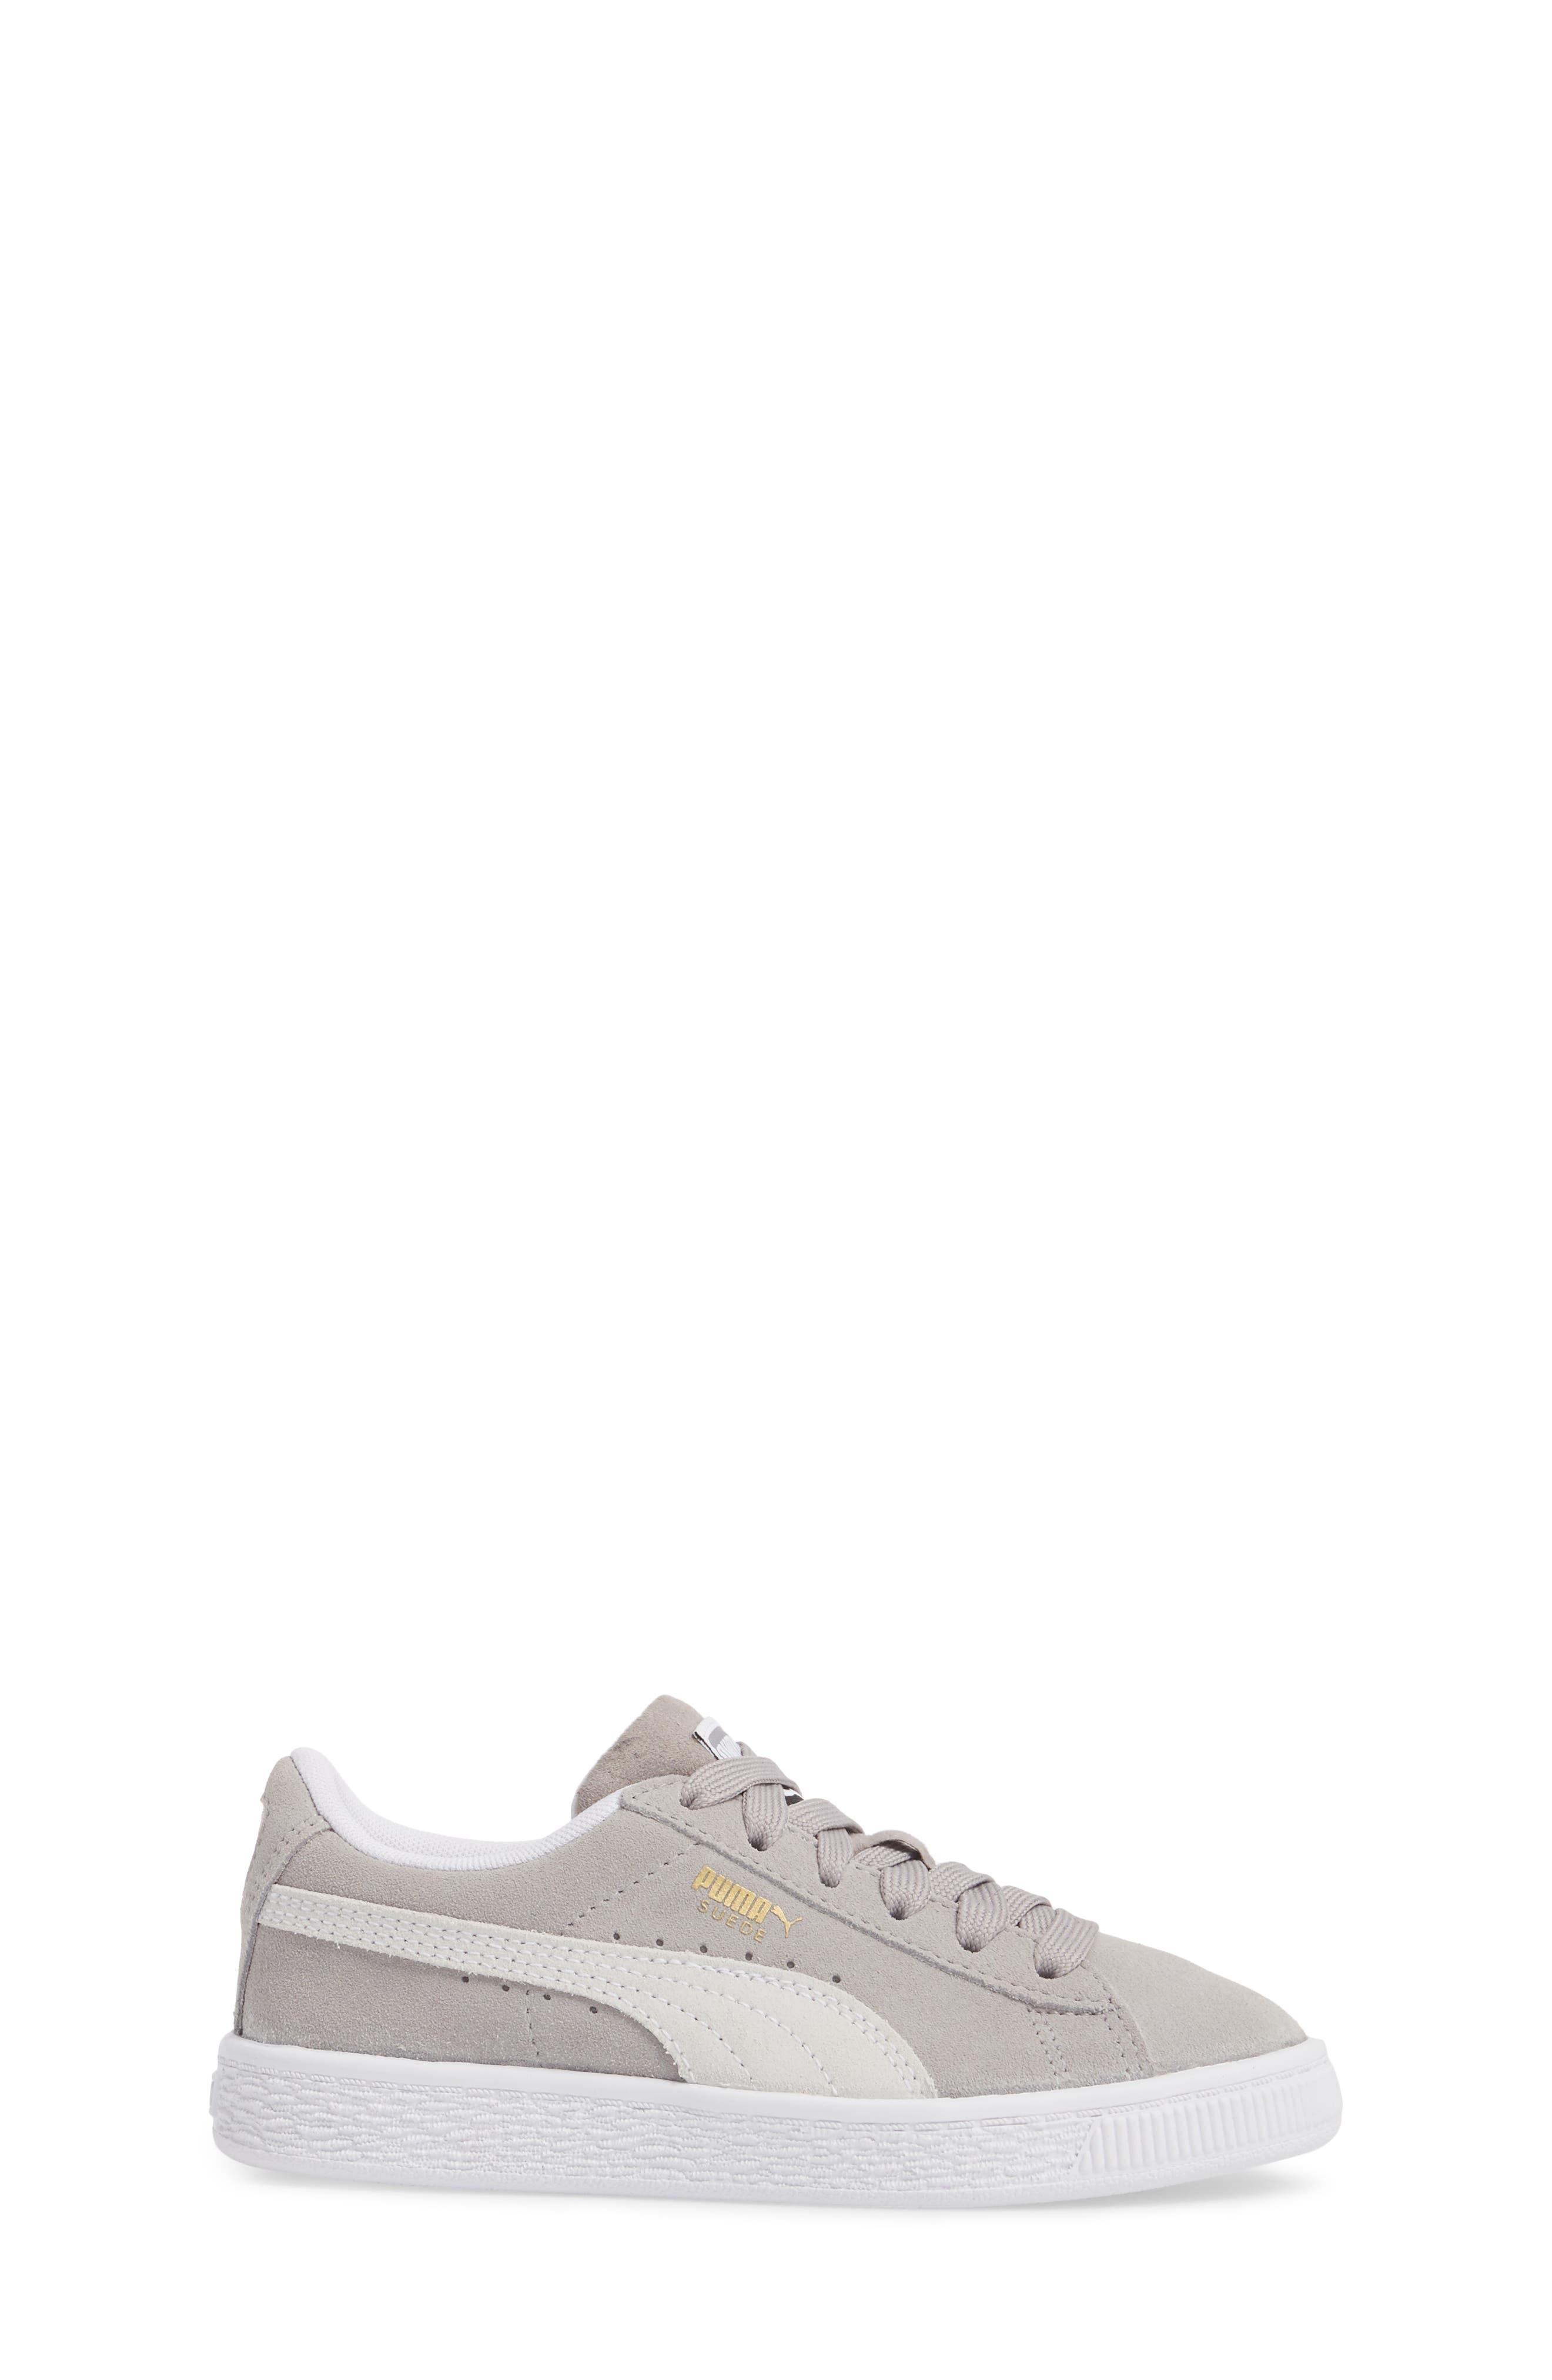 Suede Sneaker,                             Alternate thumbnail 3, color,                             Ash/ Puma White